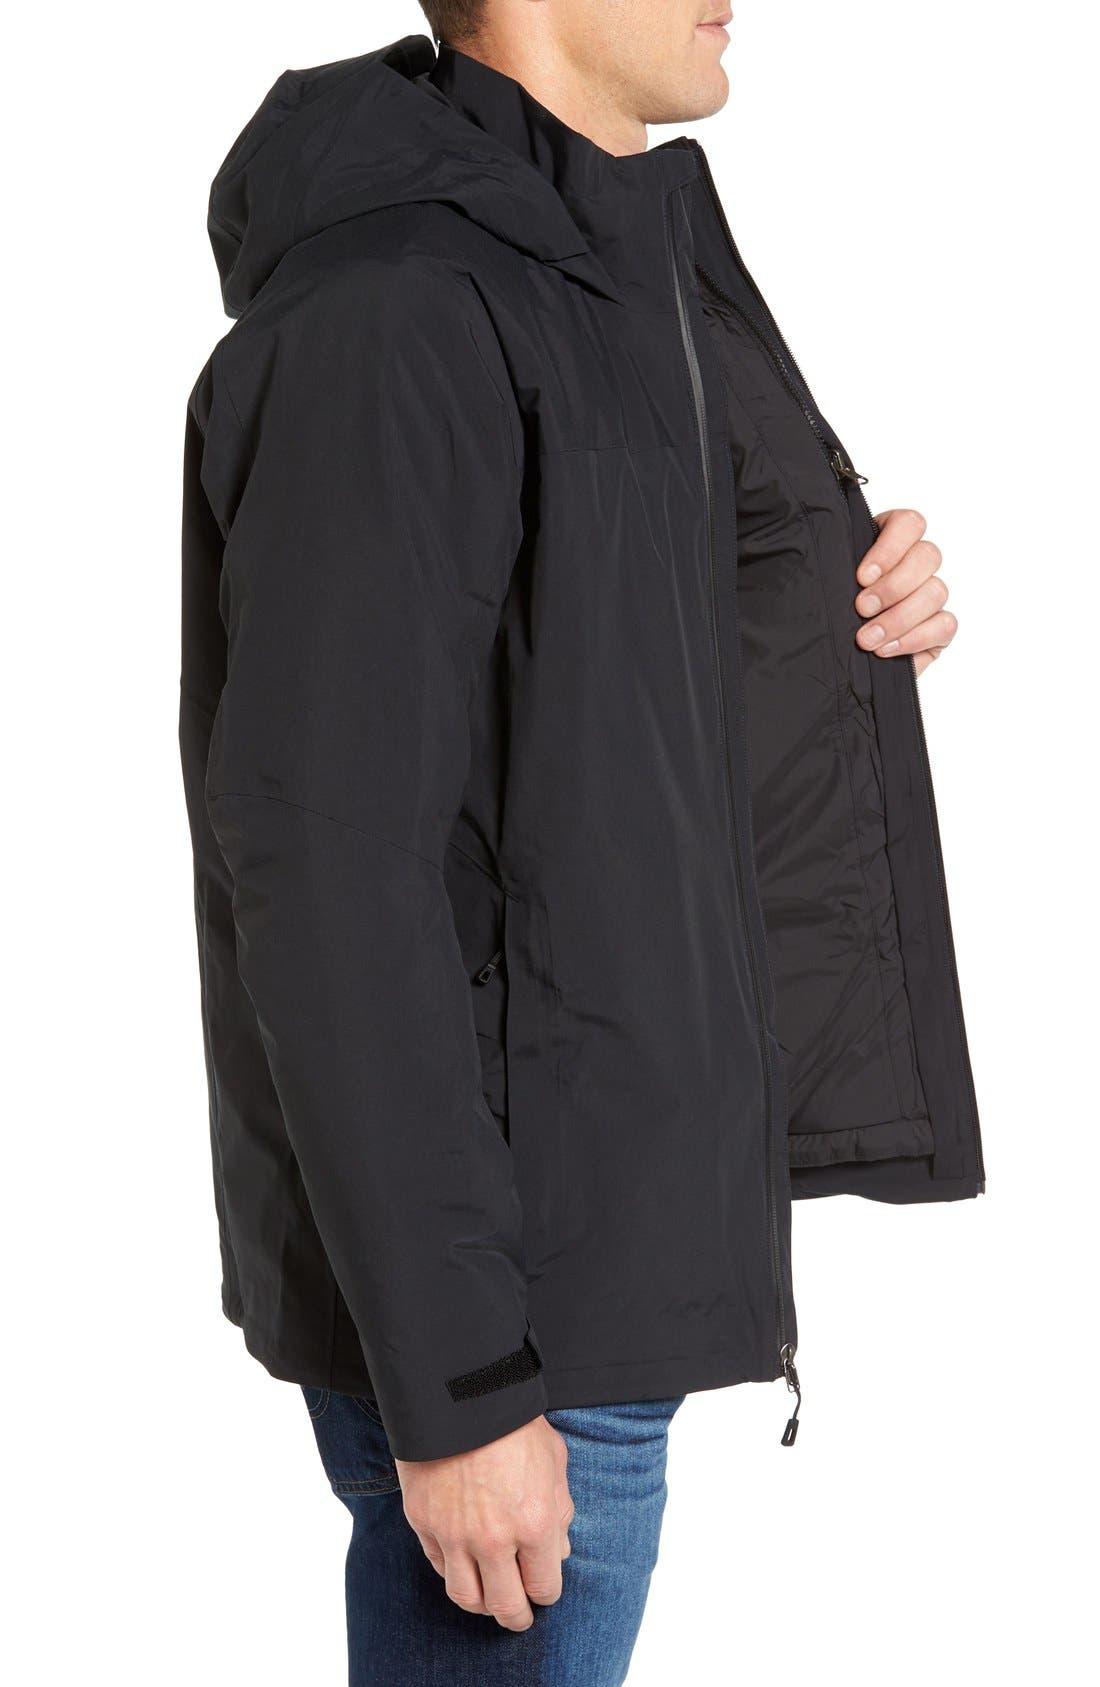 Windsweep 3-in-1 Jacket,                             Alternate thumbnail 3, color,                             Black